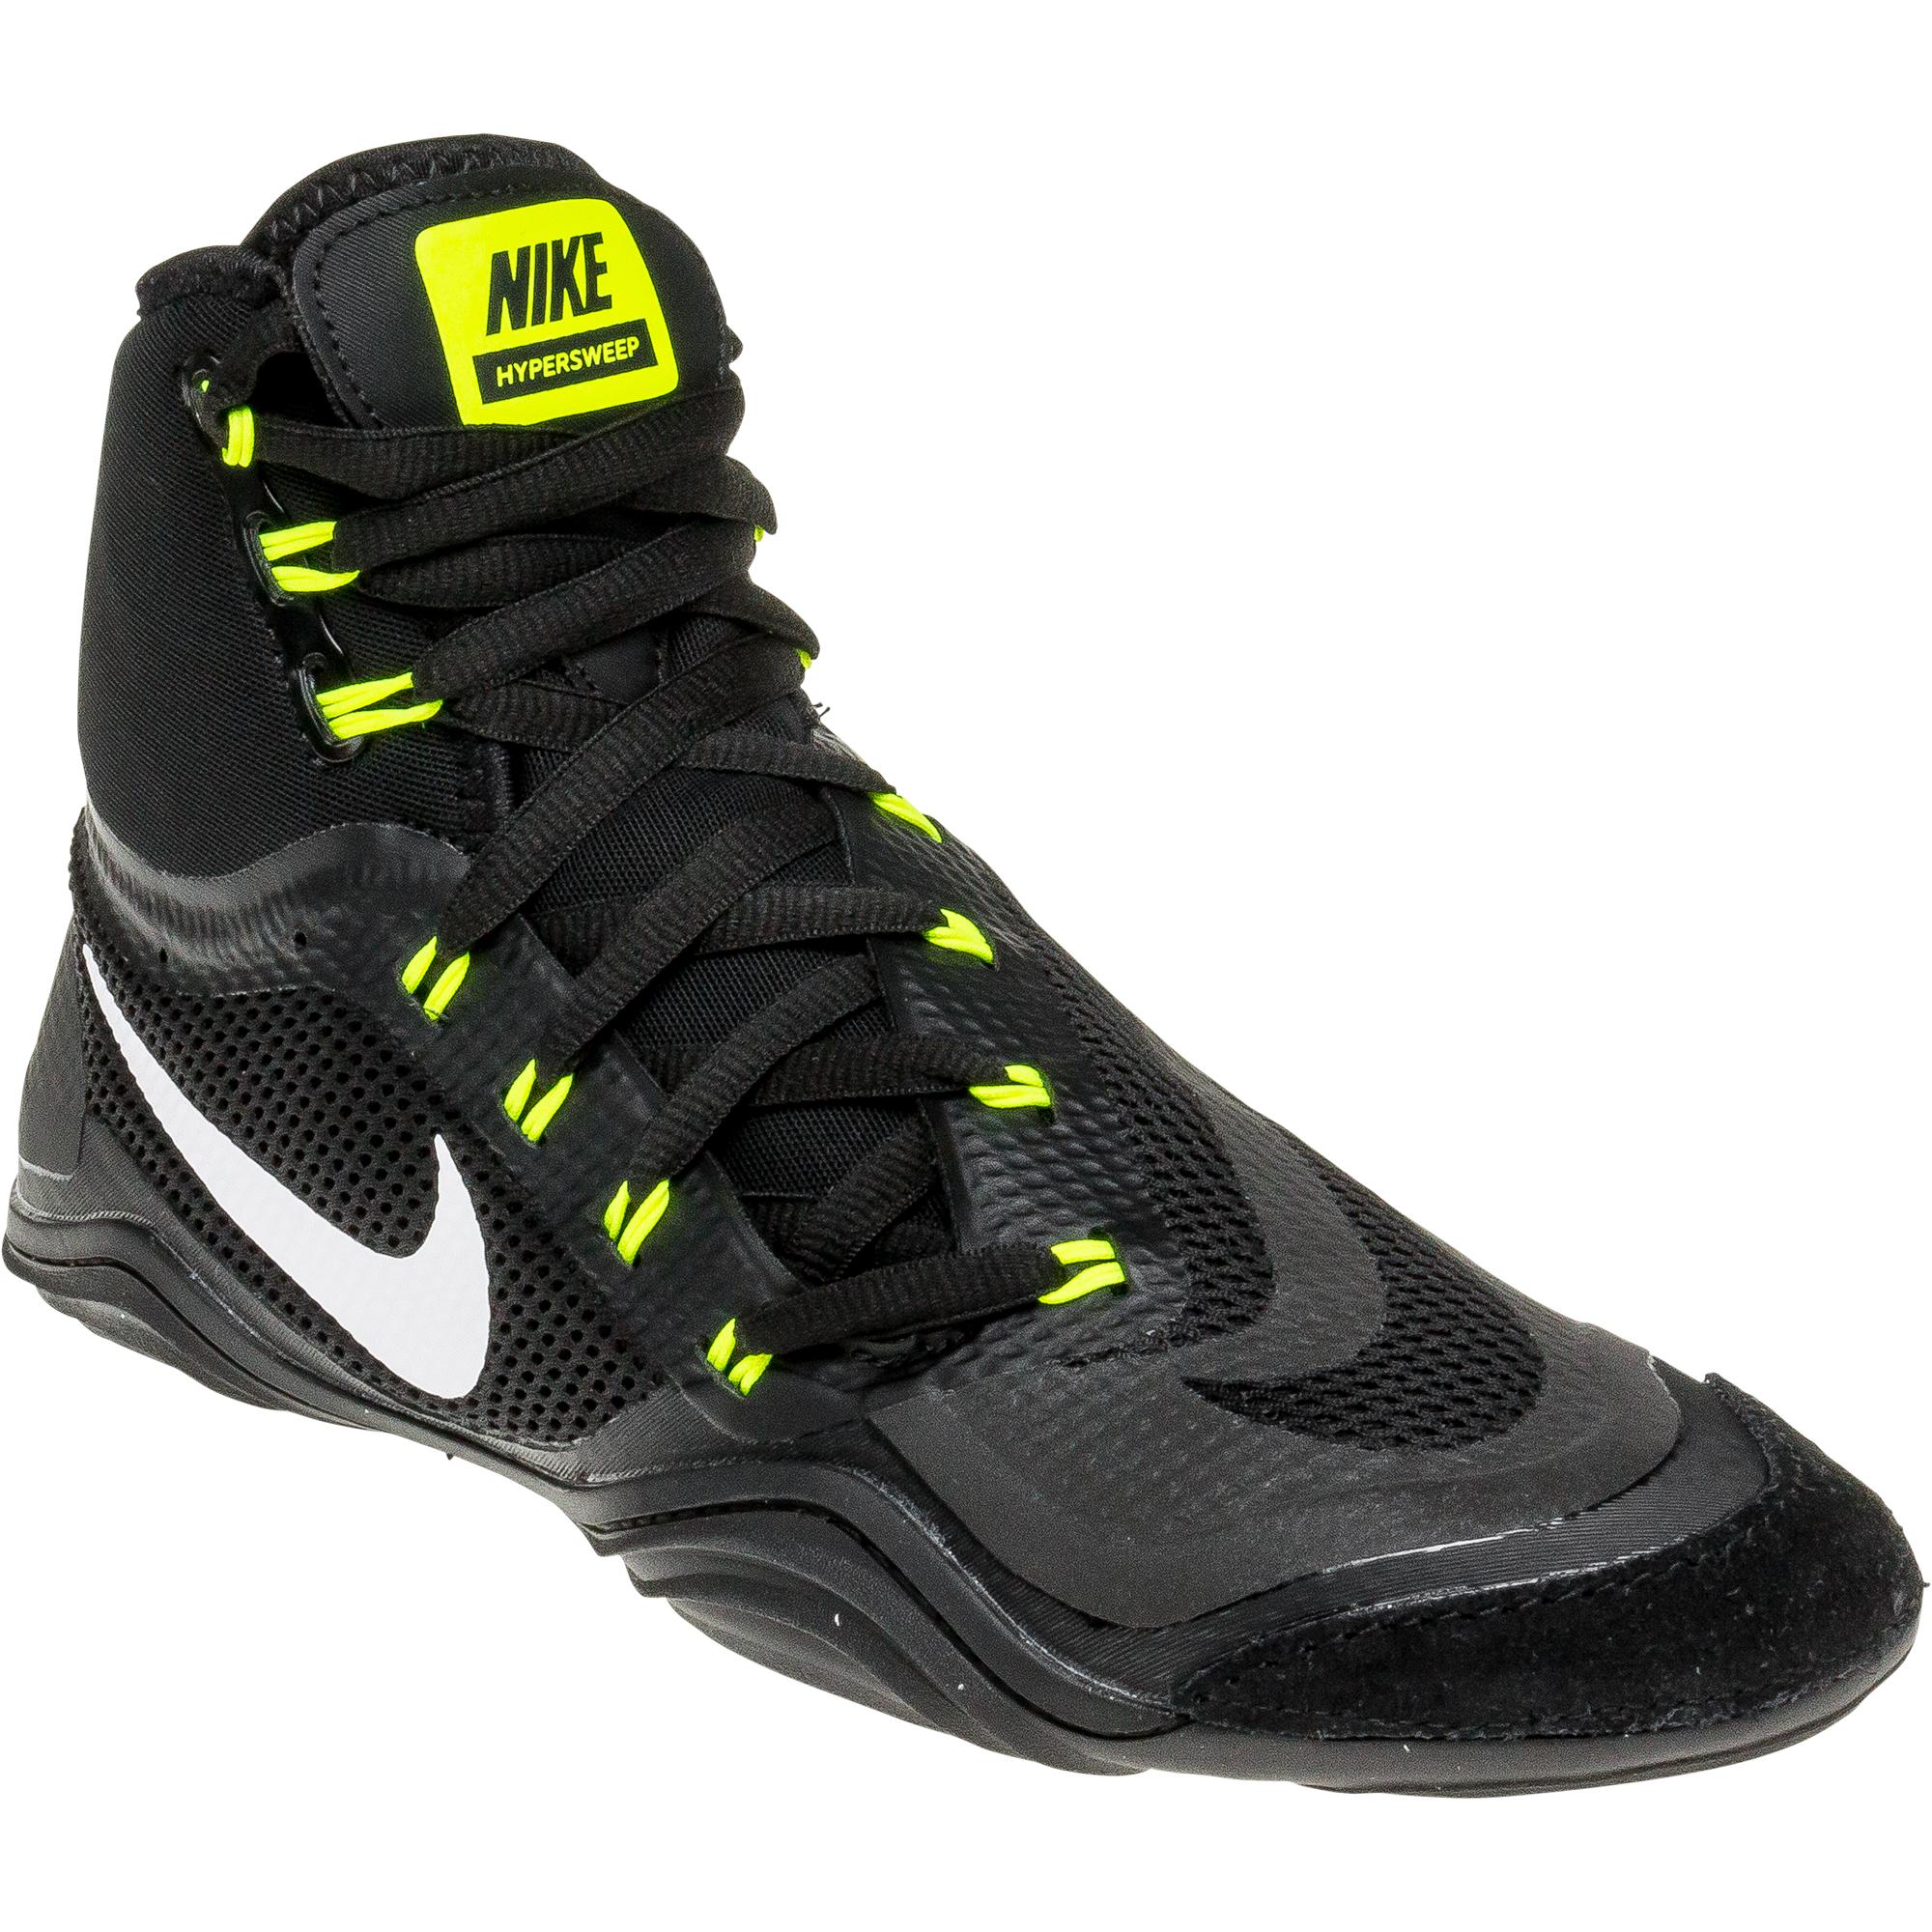 Nike Hypersweep Black   WrestlingGear